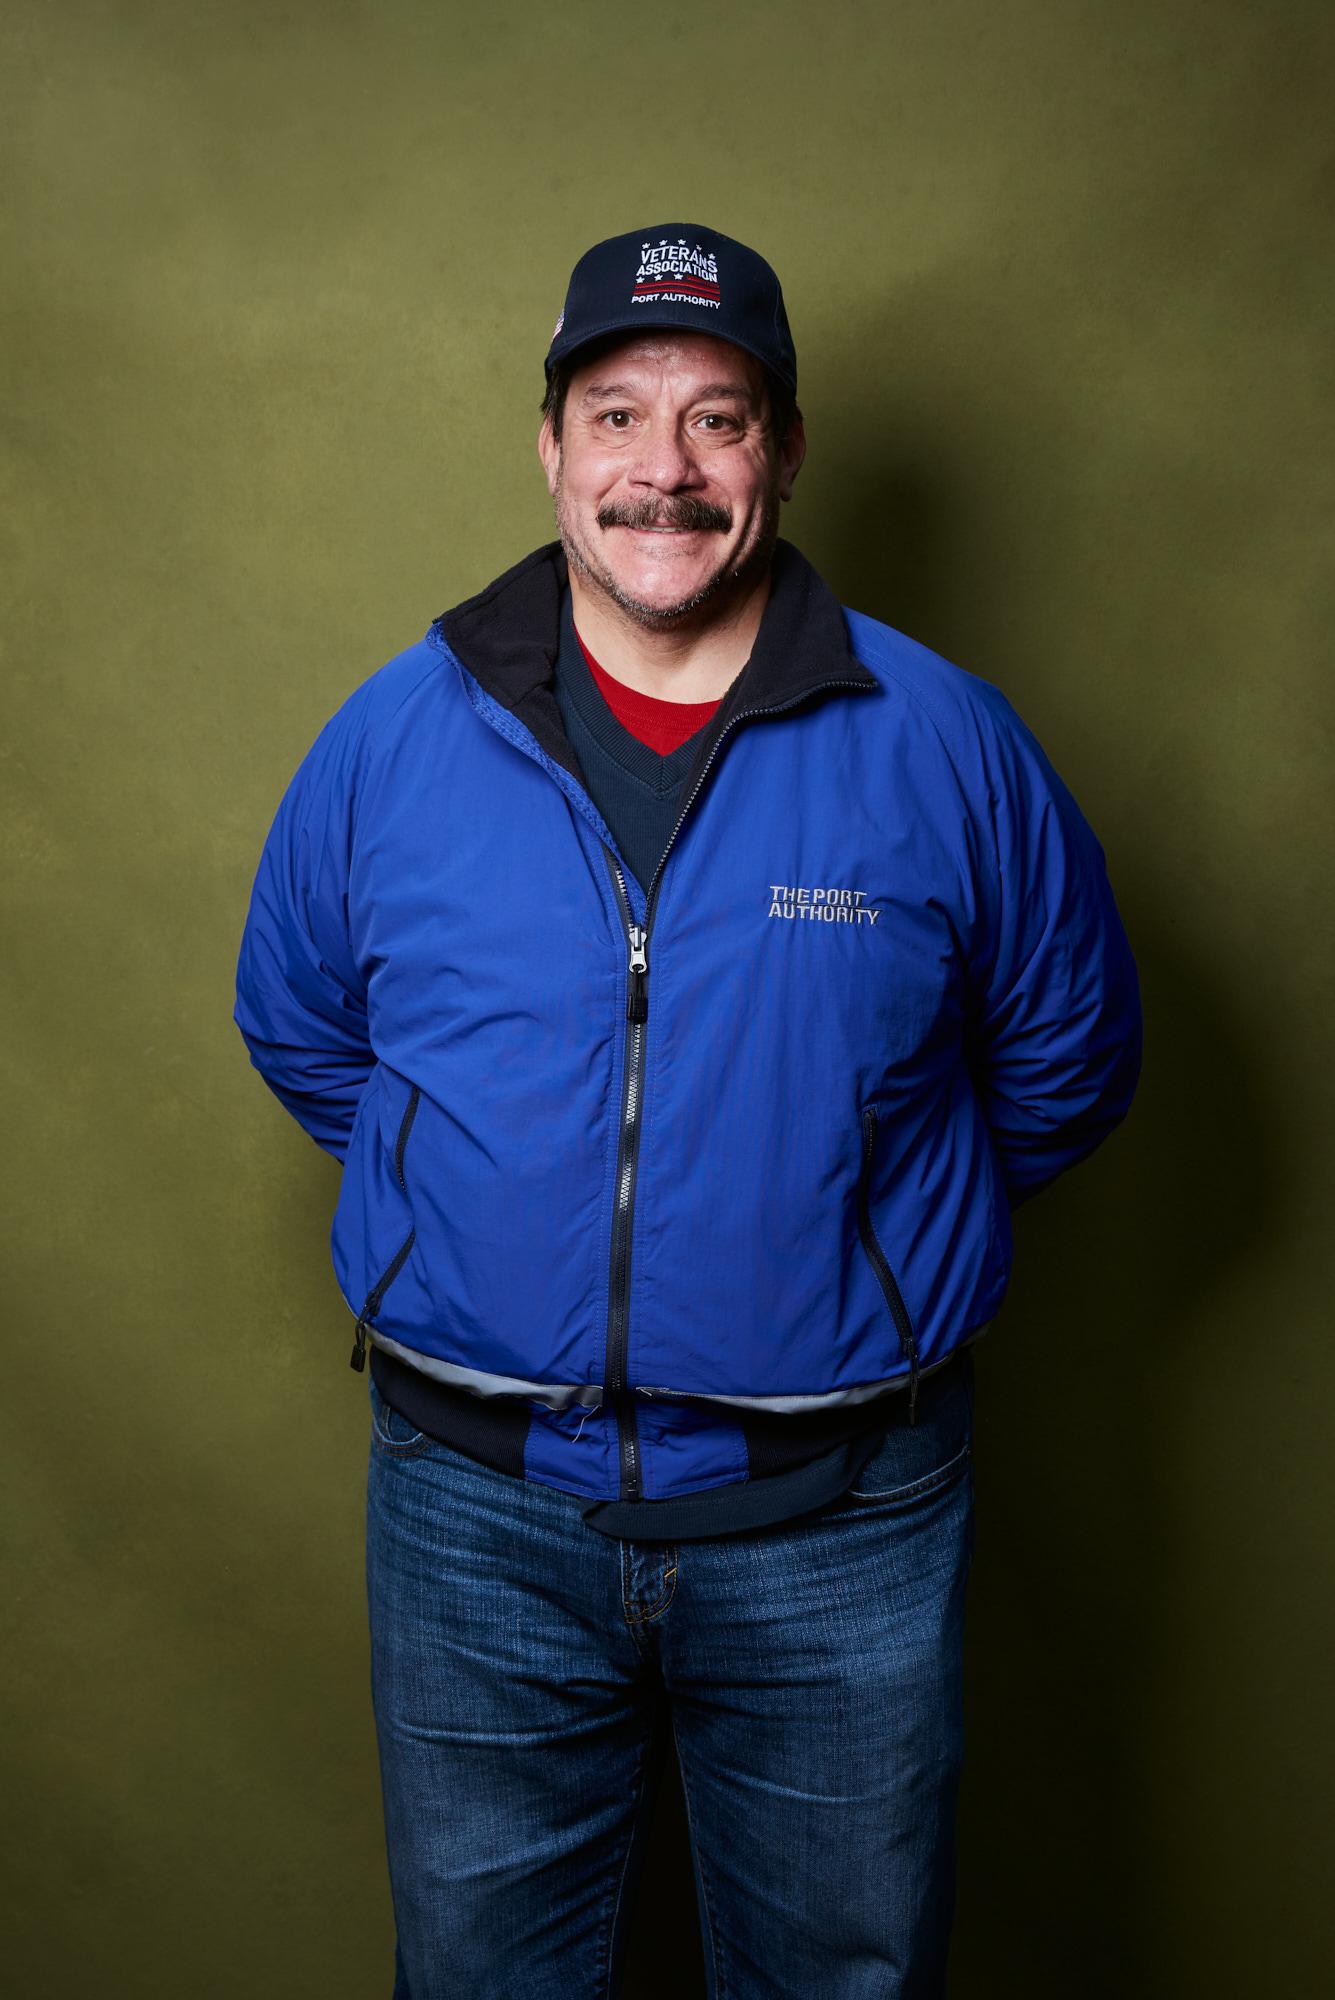 Sergeant David Gutierrez